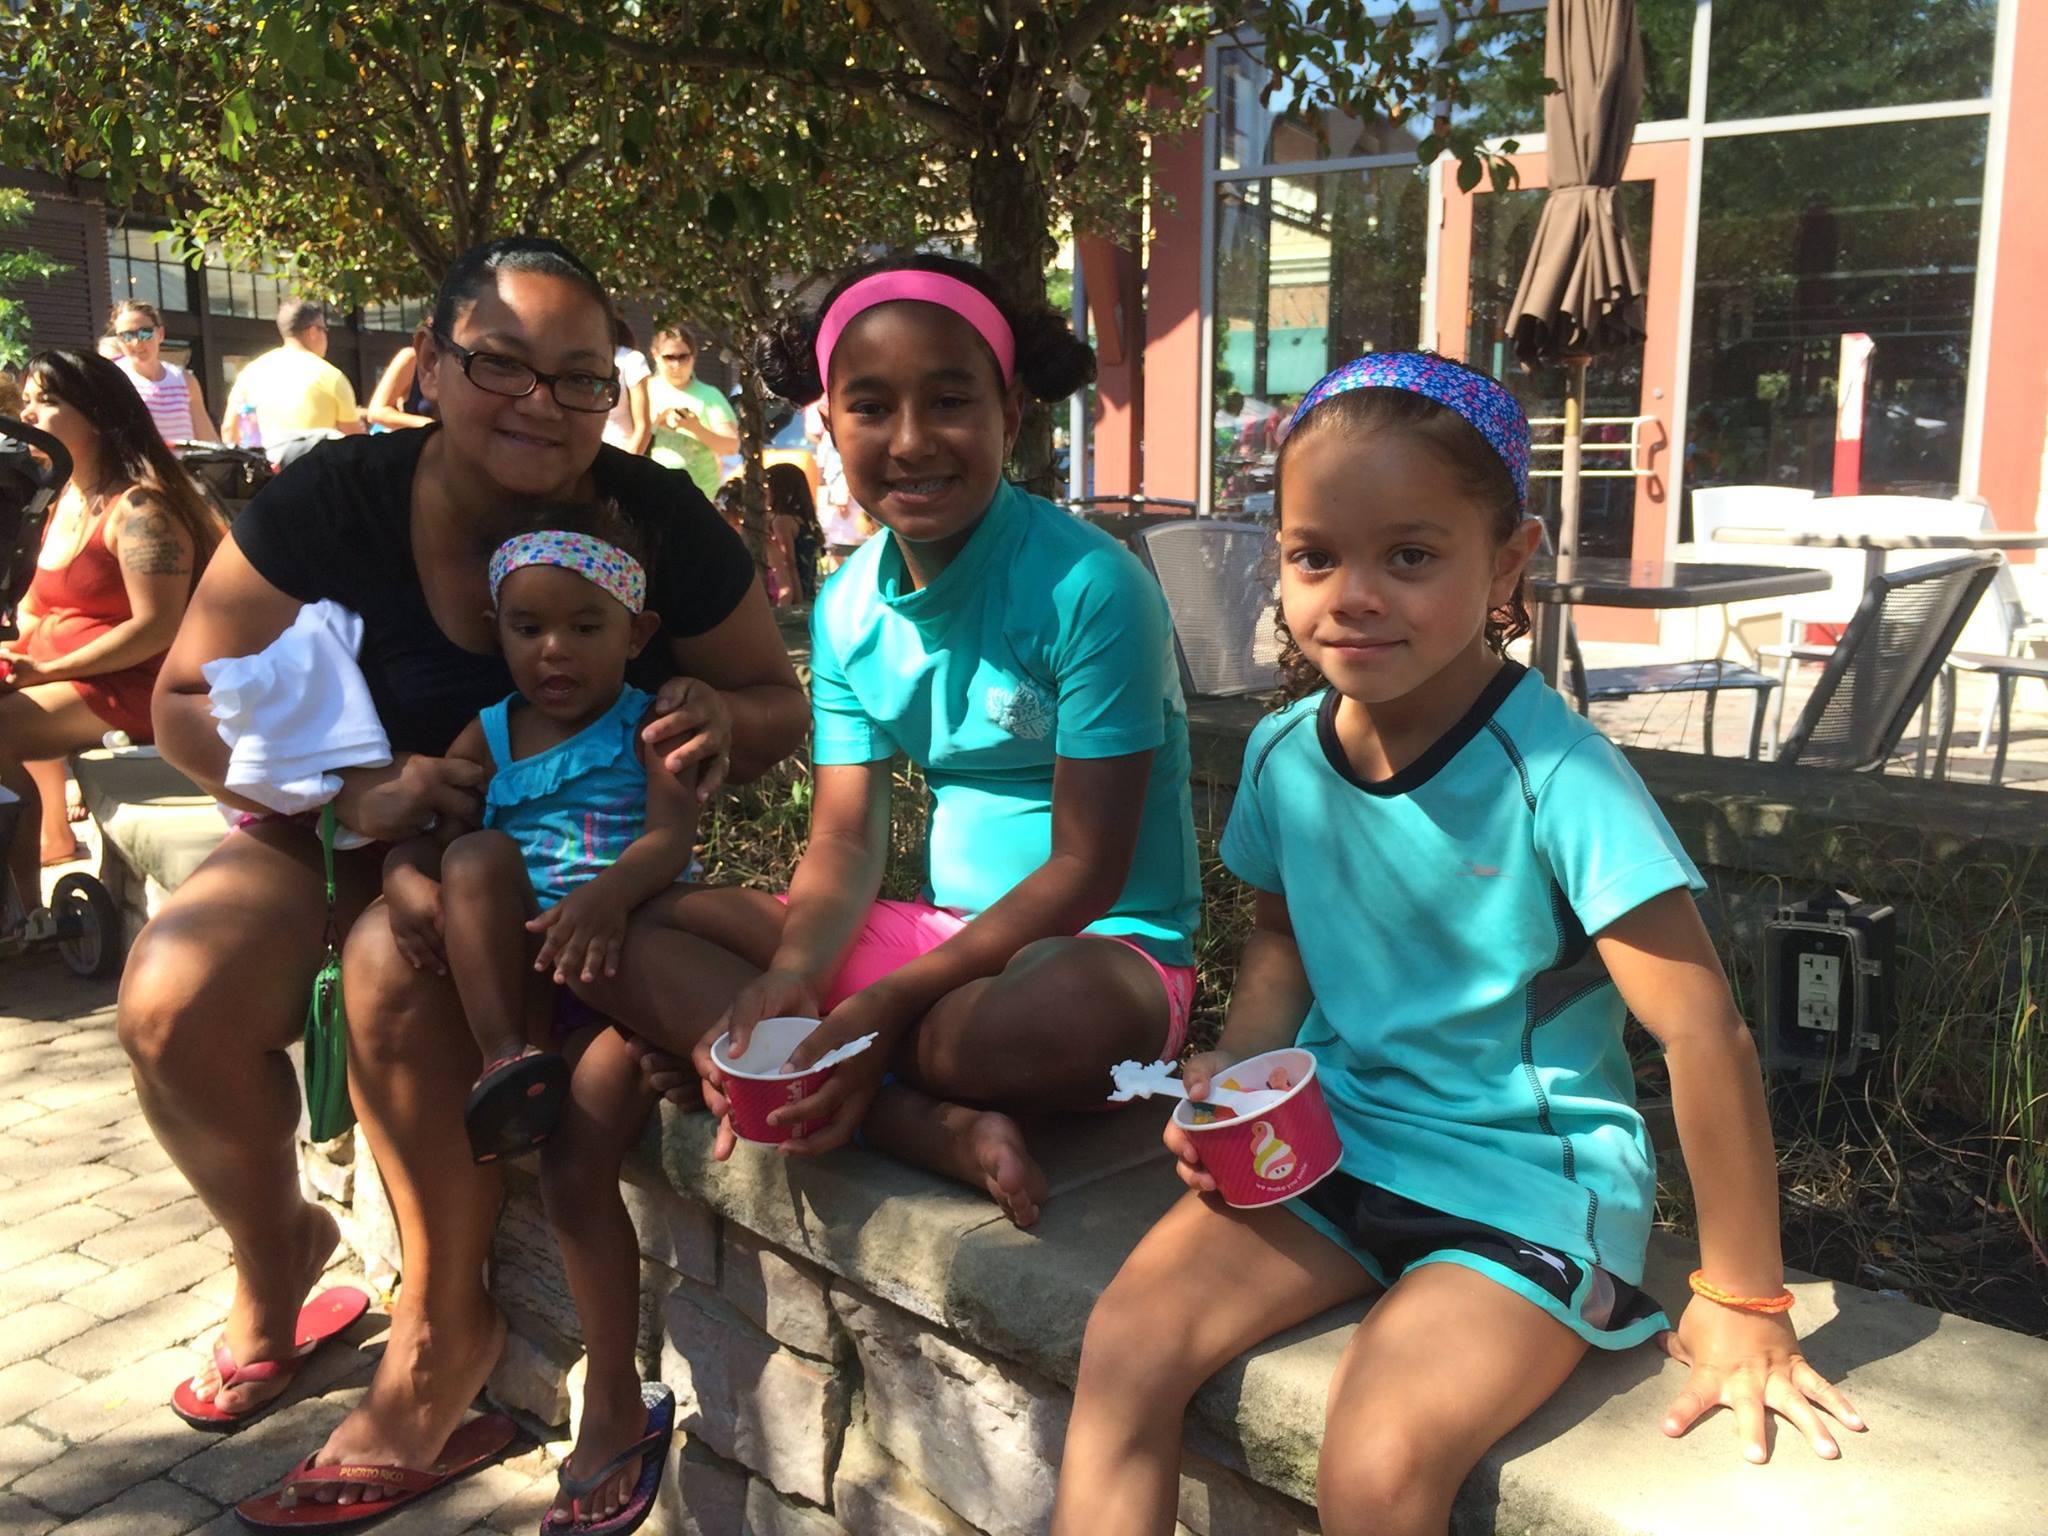 Family-friendly event at Crocker Park in Westlake